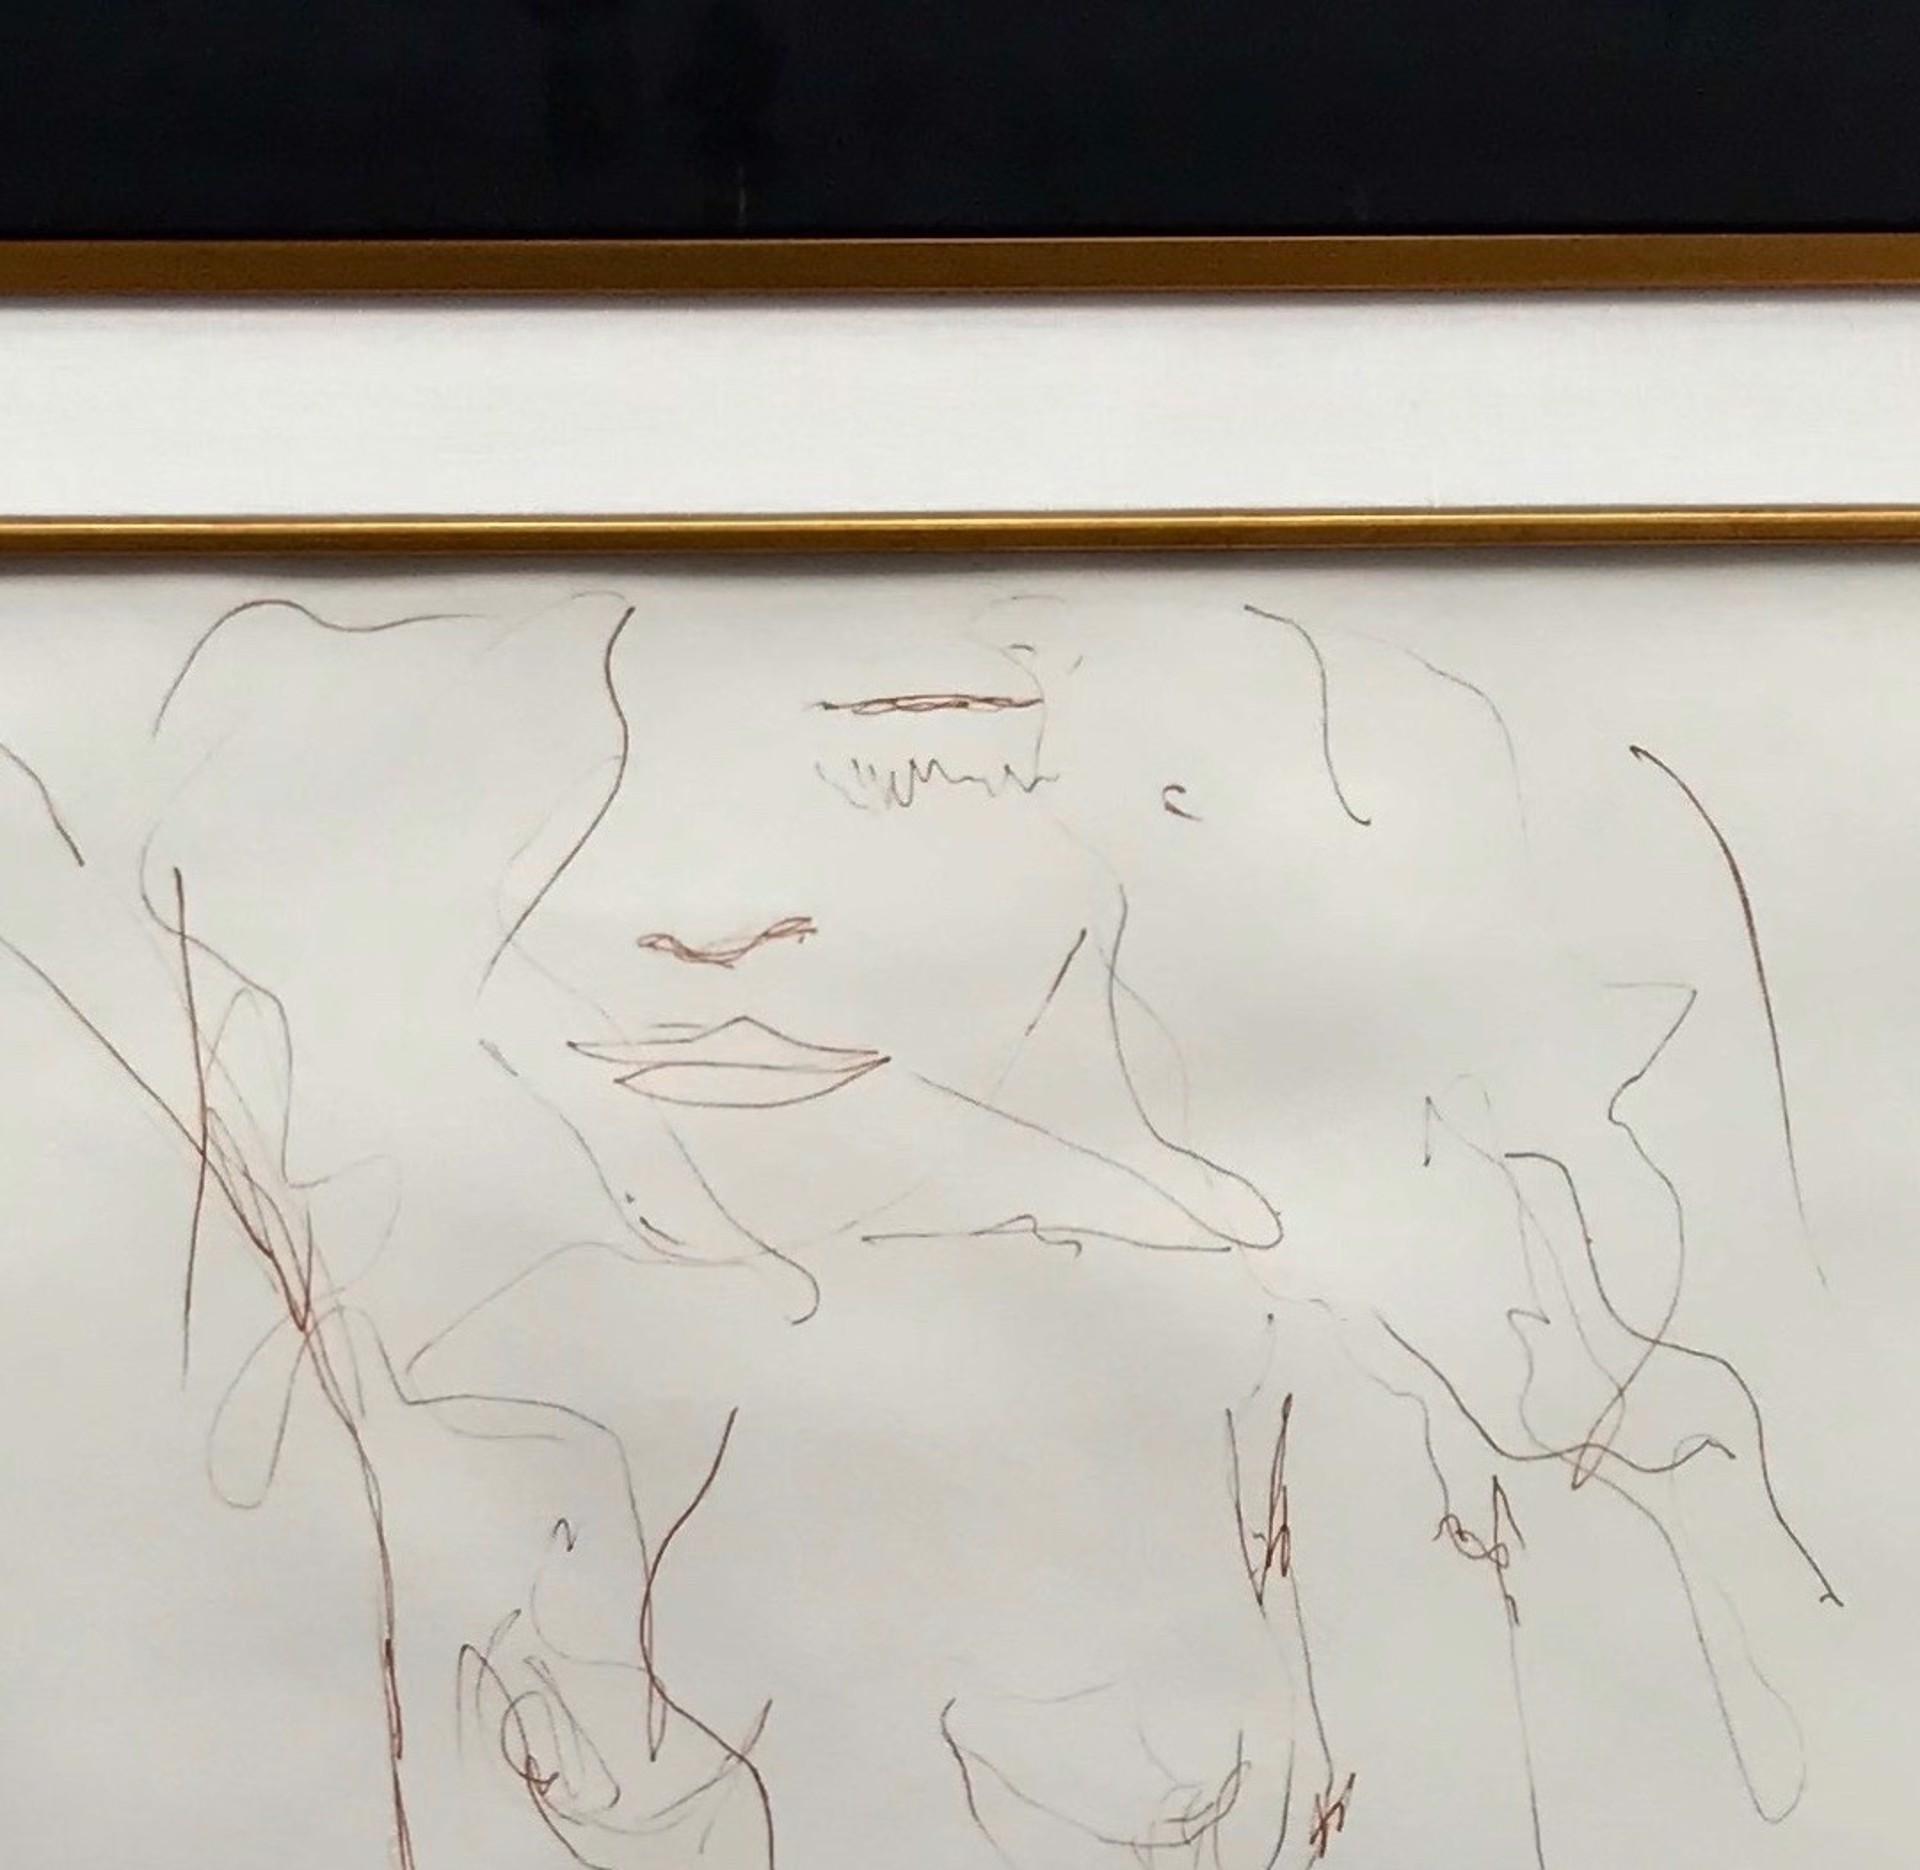 """Erotic #7""  From The ""Bag One"" Portfolio by John Lennon"